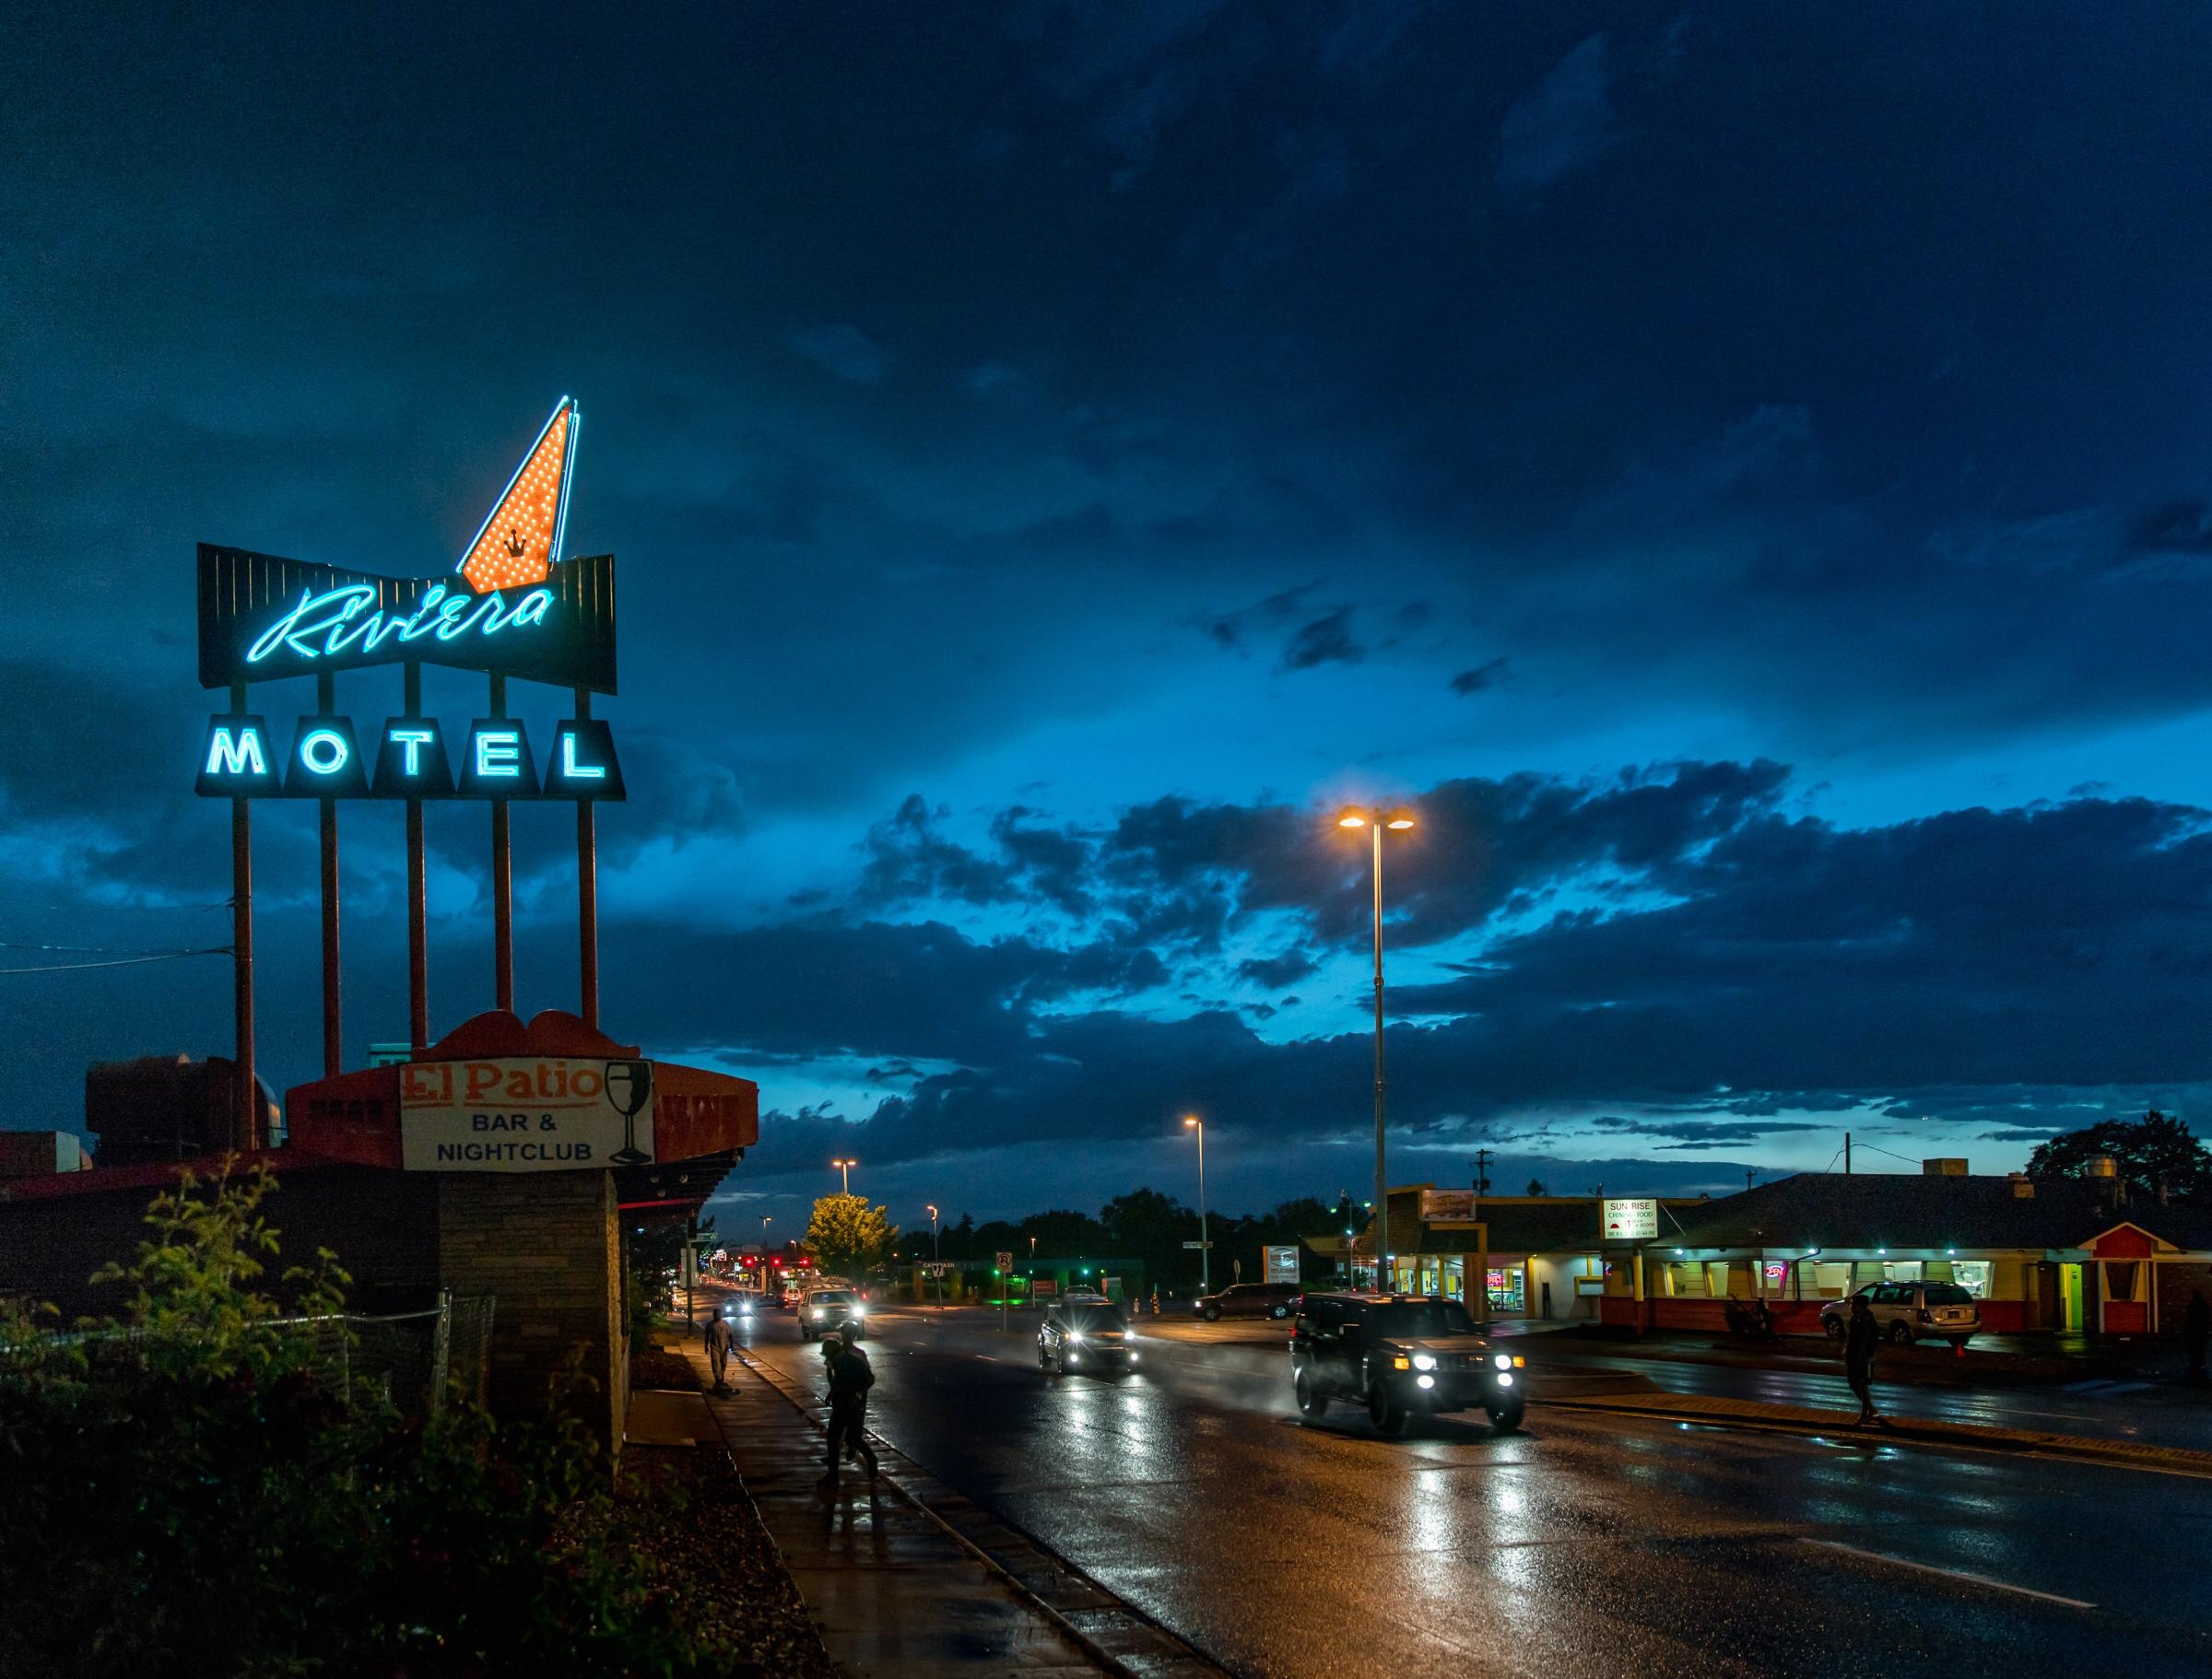 Riviera Motel - 9100 East Colfax Avenue, Aurora, Colorado U.S.A. - June 13, 2016